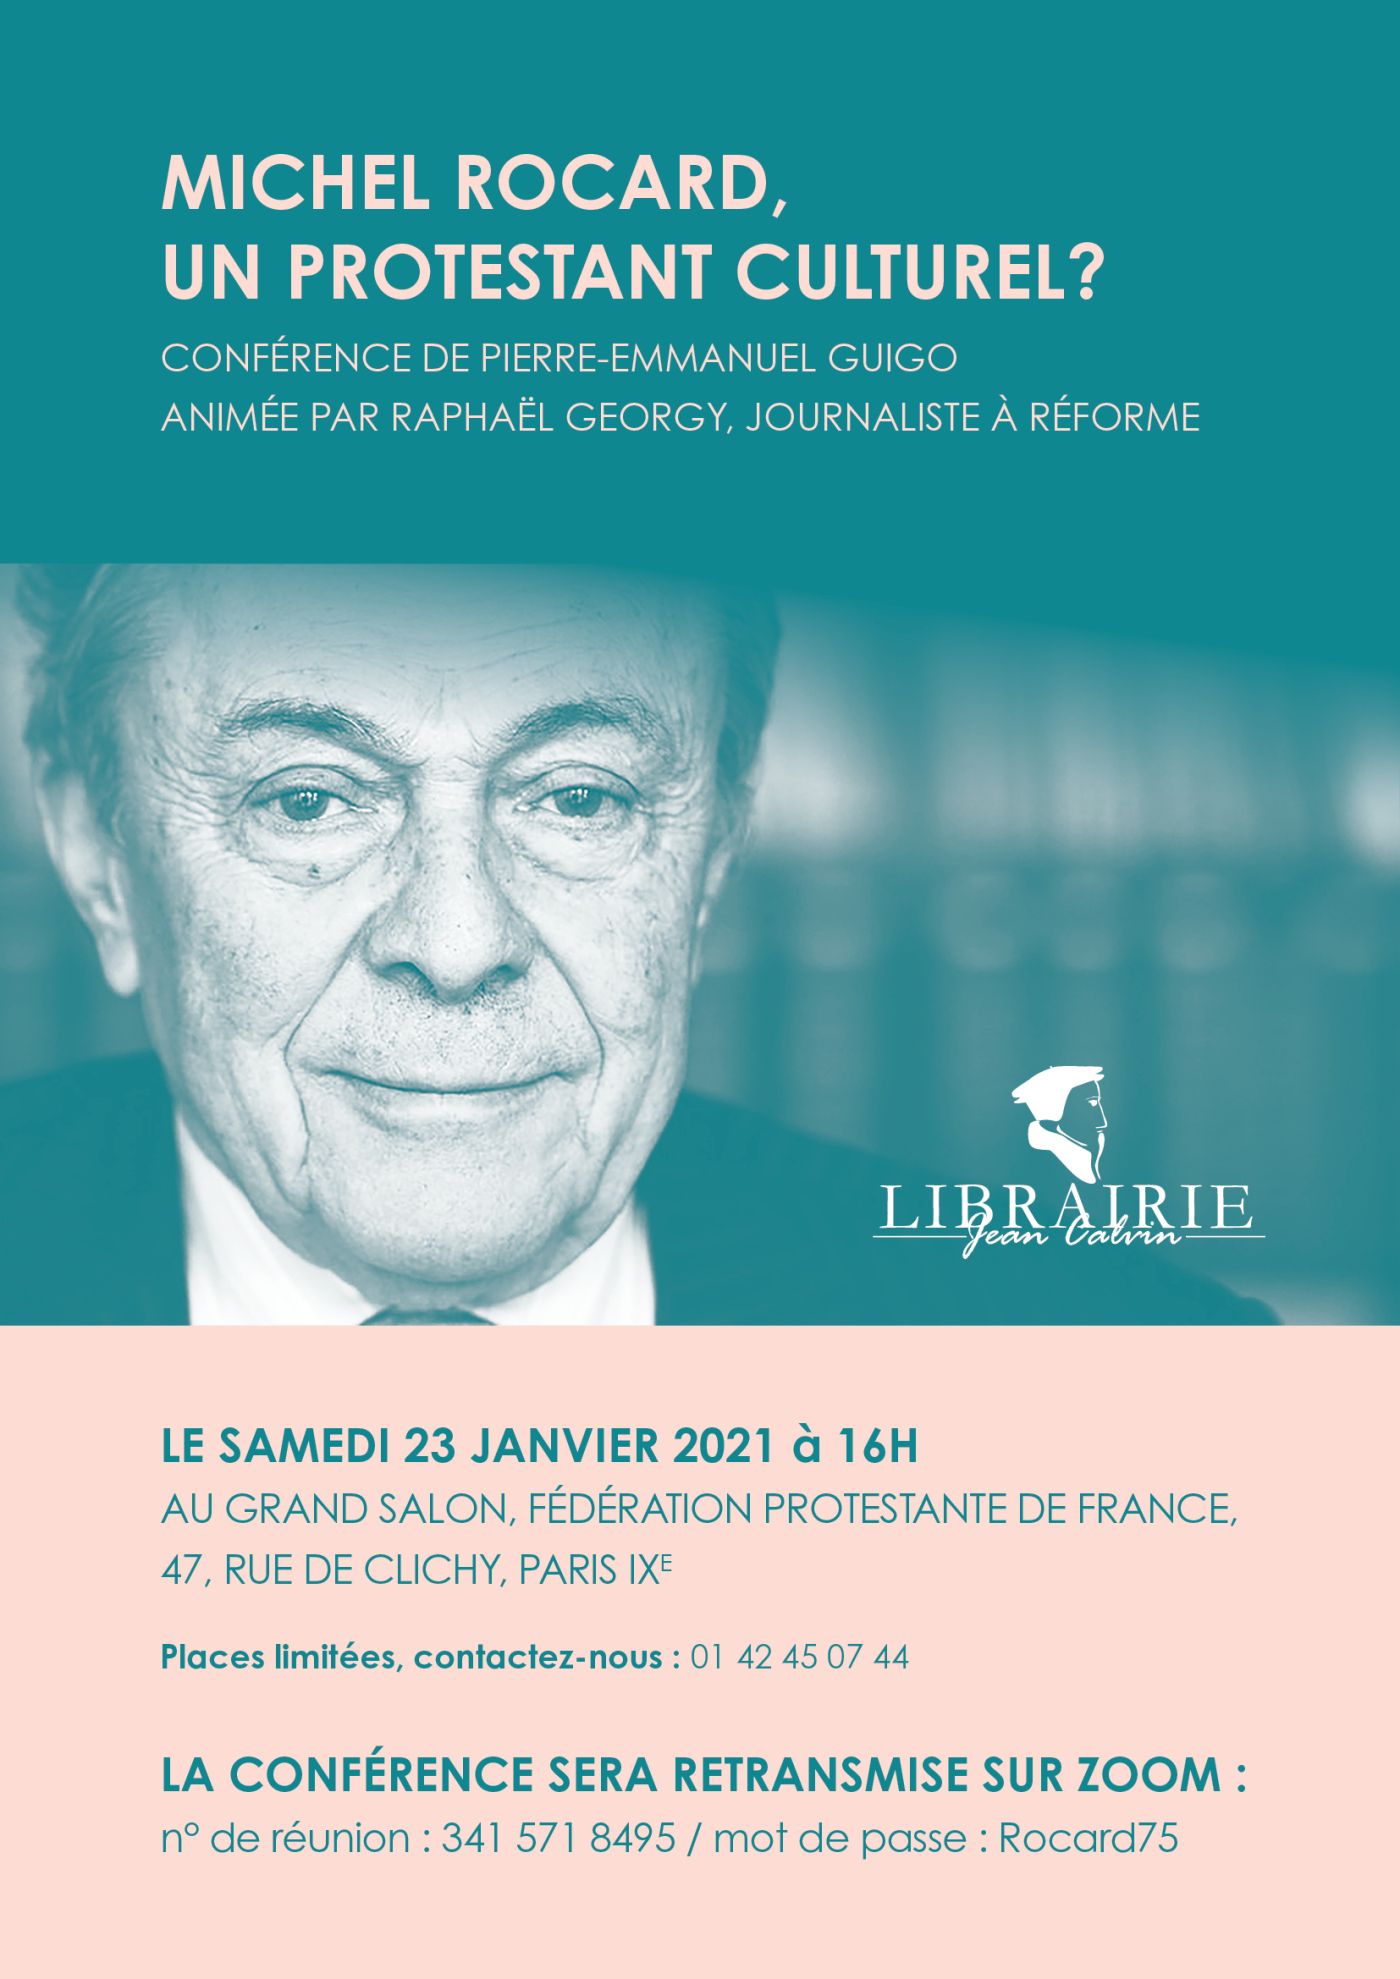 https://www.librairiejeancalvin.fr/var/data_ljc/doc/conf-michel-rocard-2.jpg